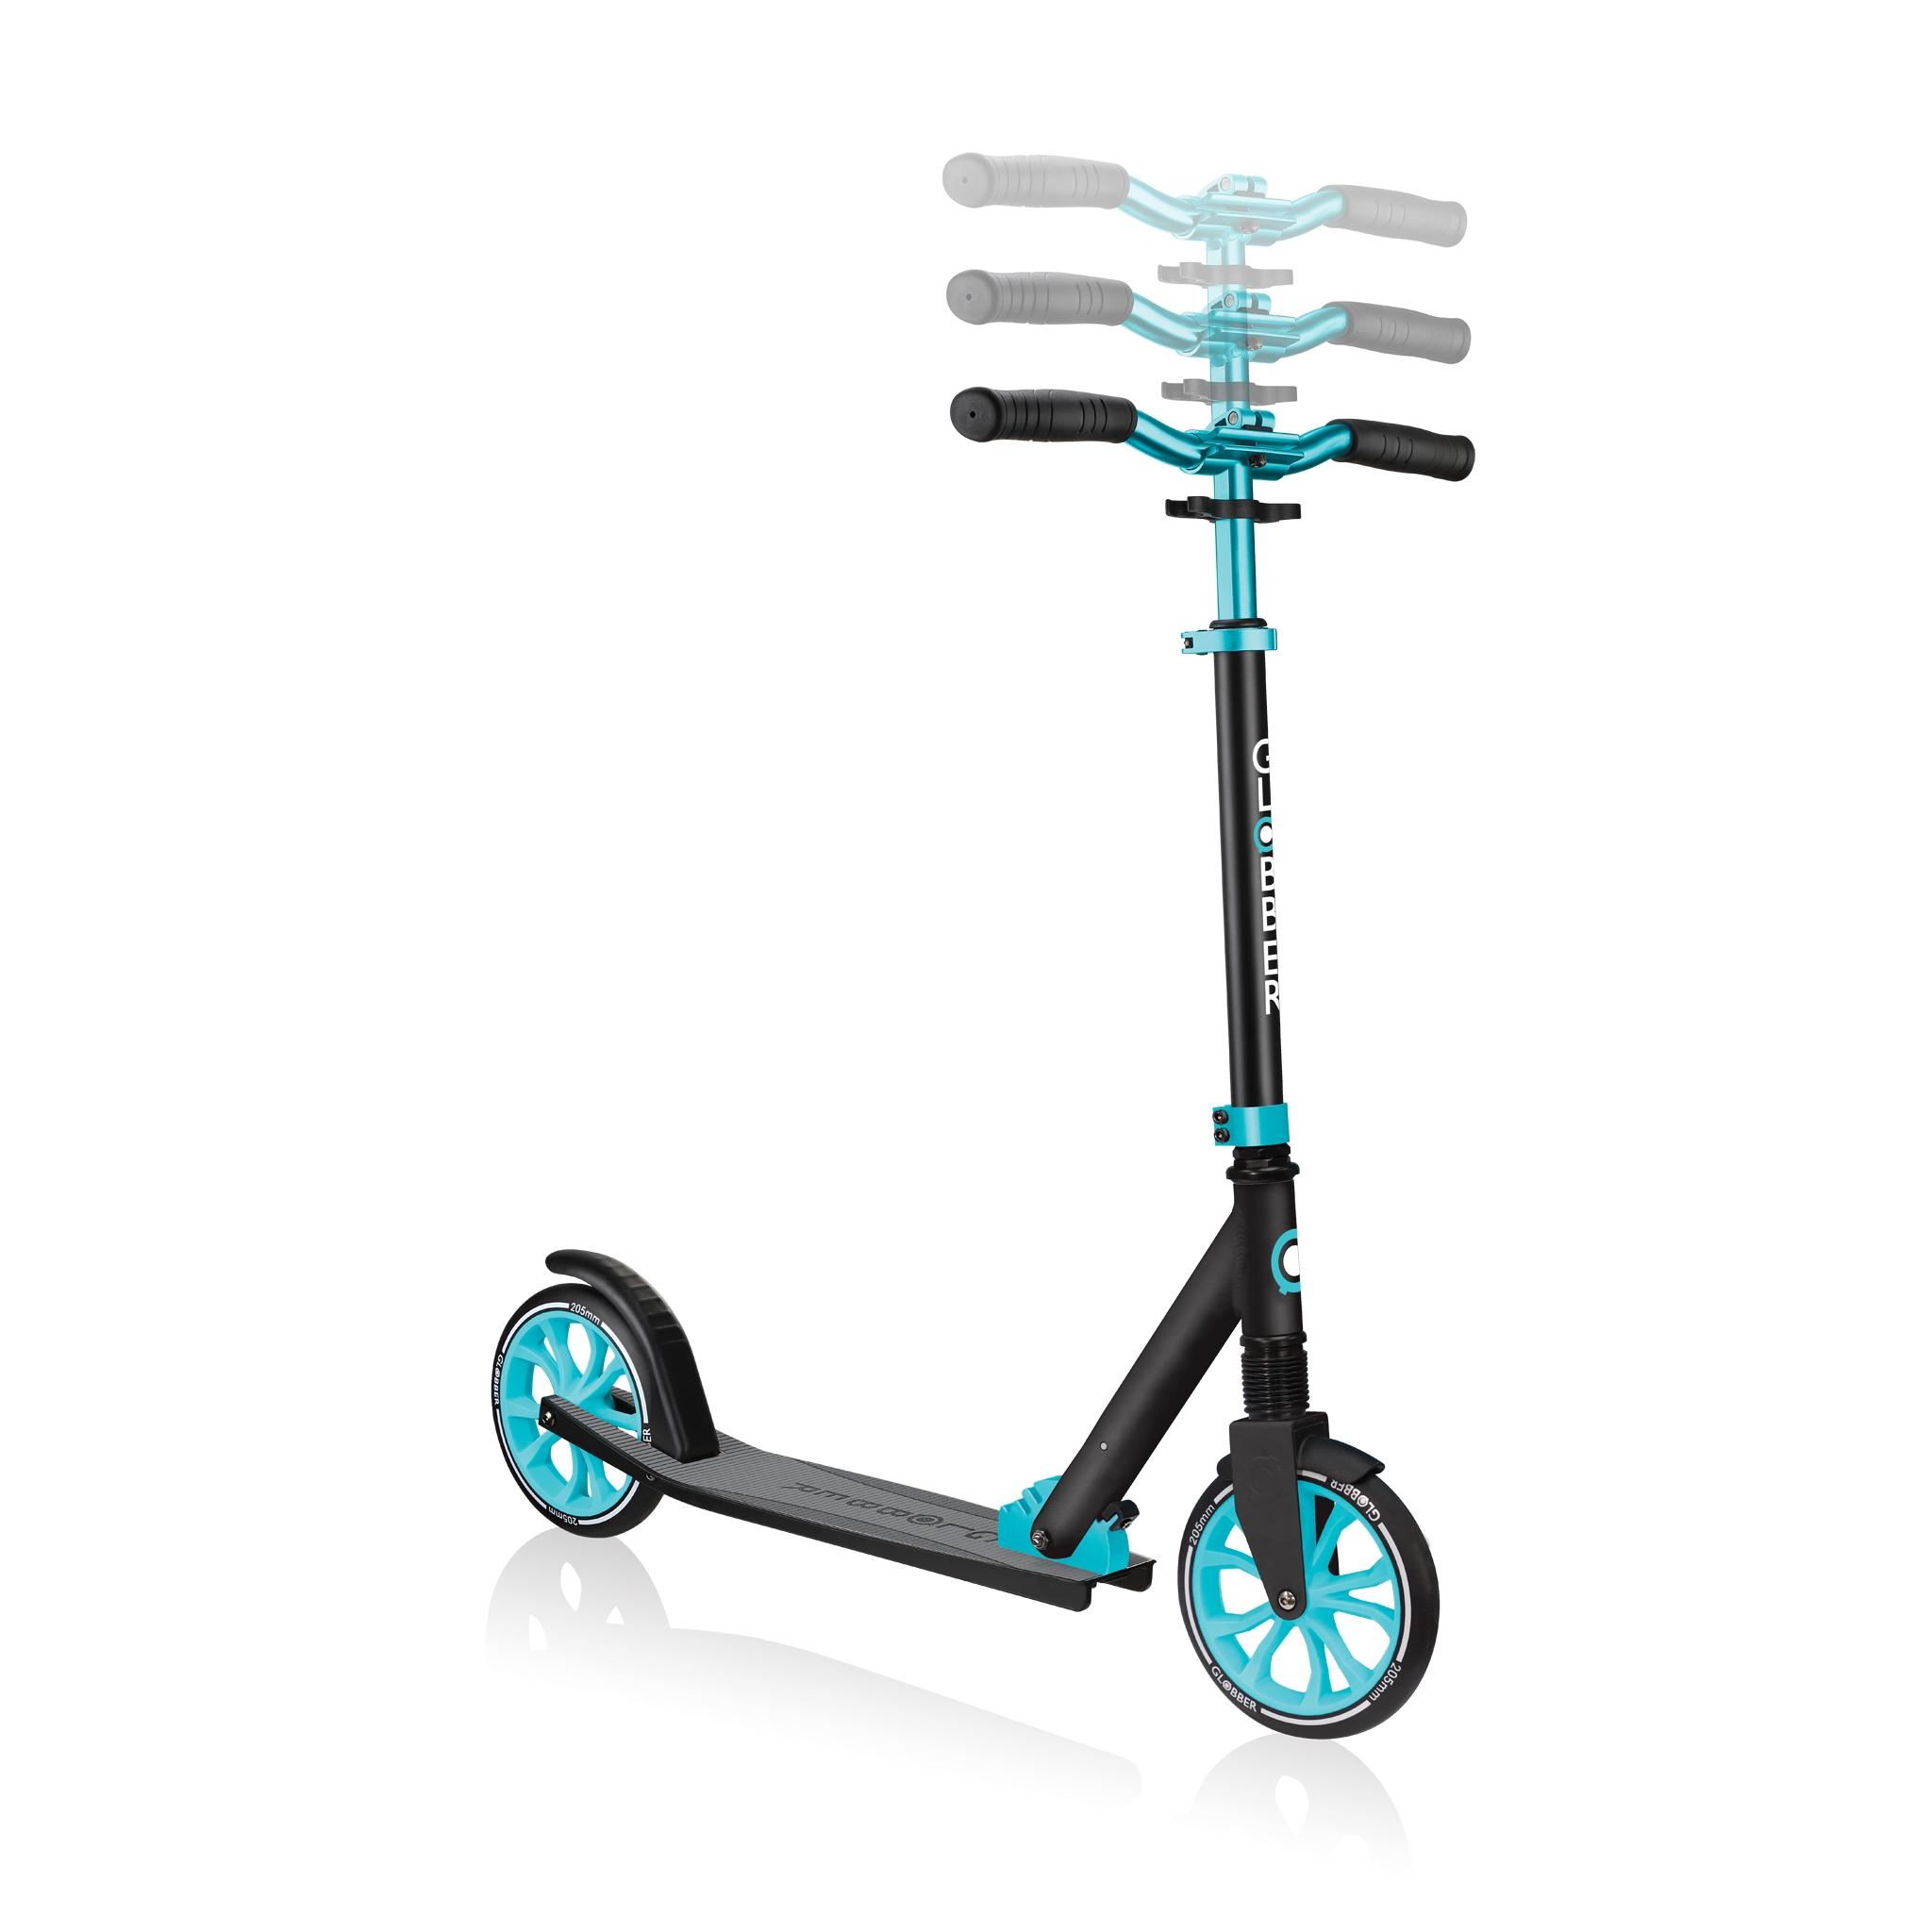 Globber-NL-205-205mm-big-wheel-scooter-for-kids-3-height-adjustable-scooter-t-bar 2